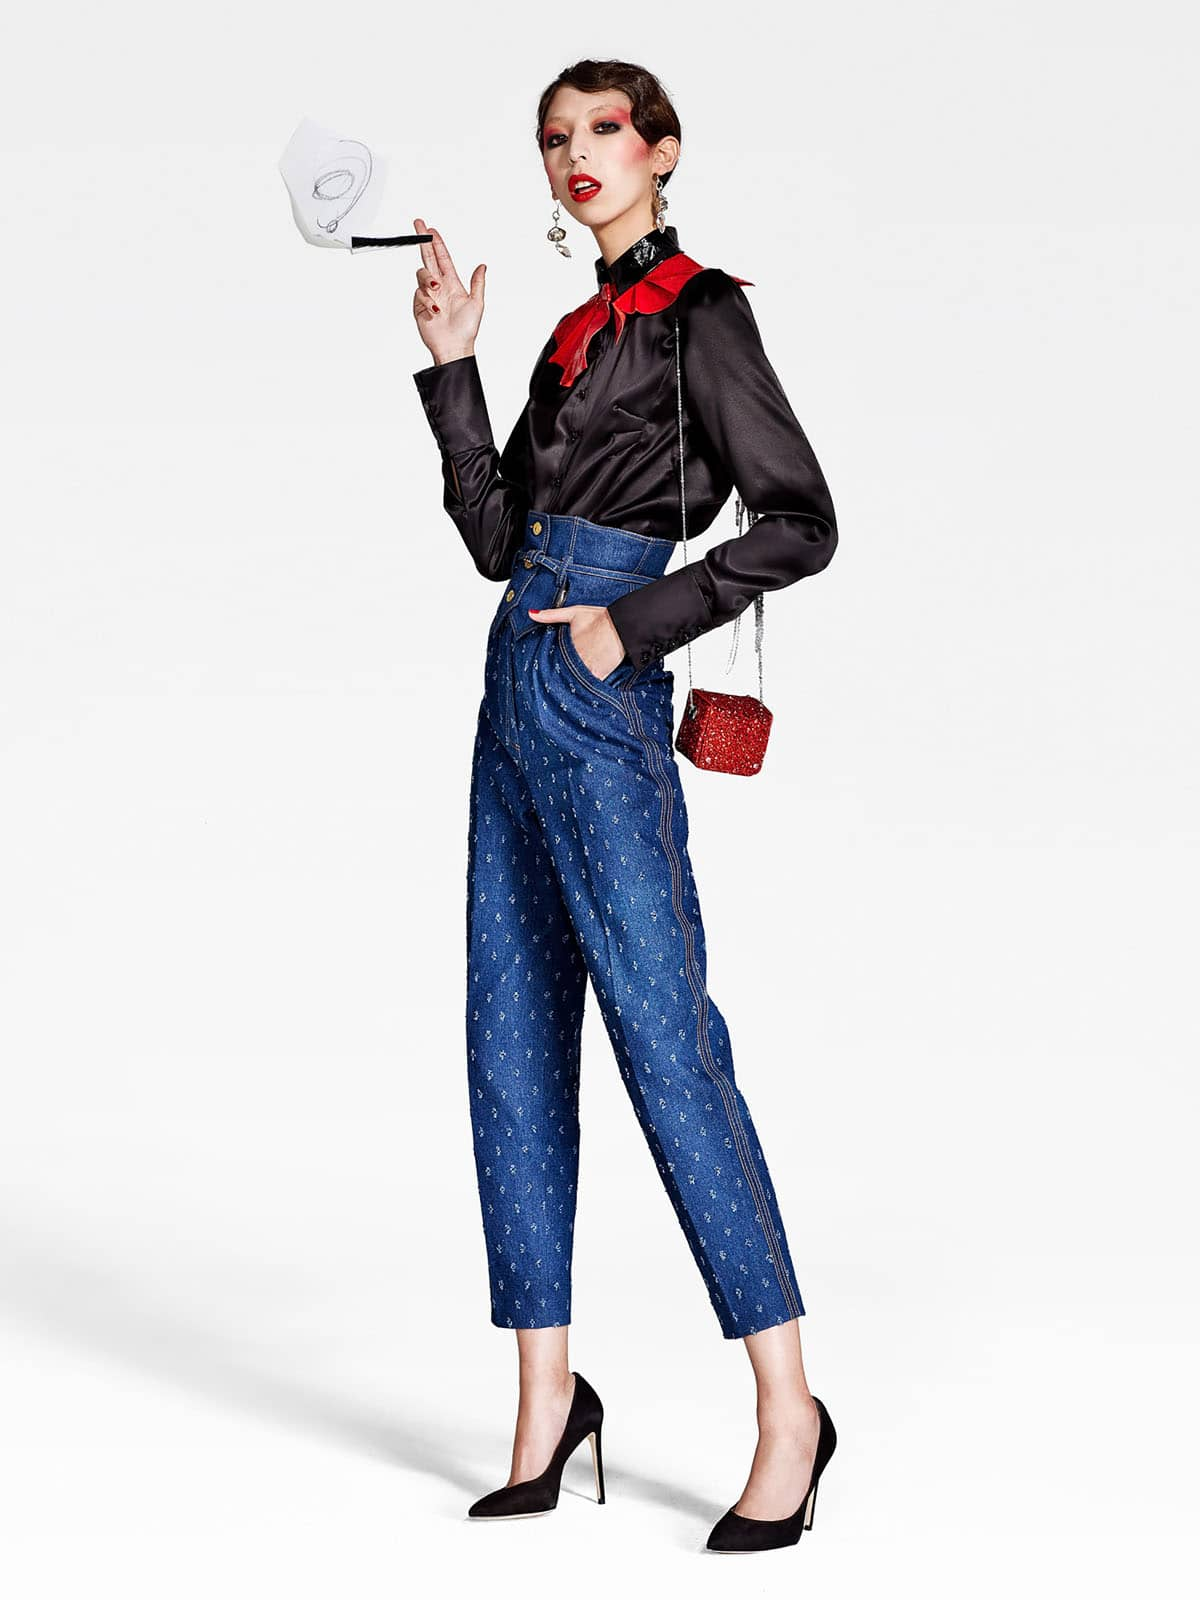 2017 Haute Couture Ronald Van Der Kemp